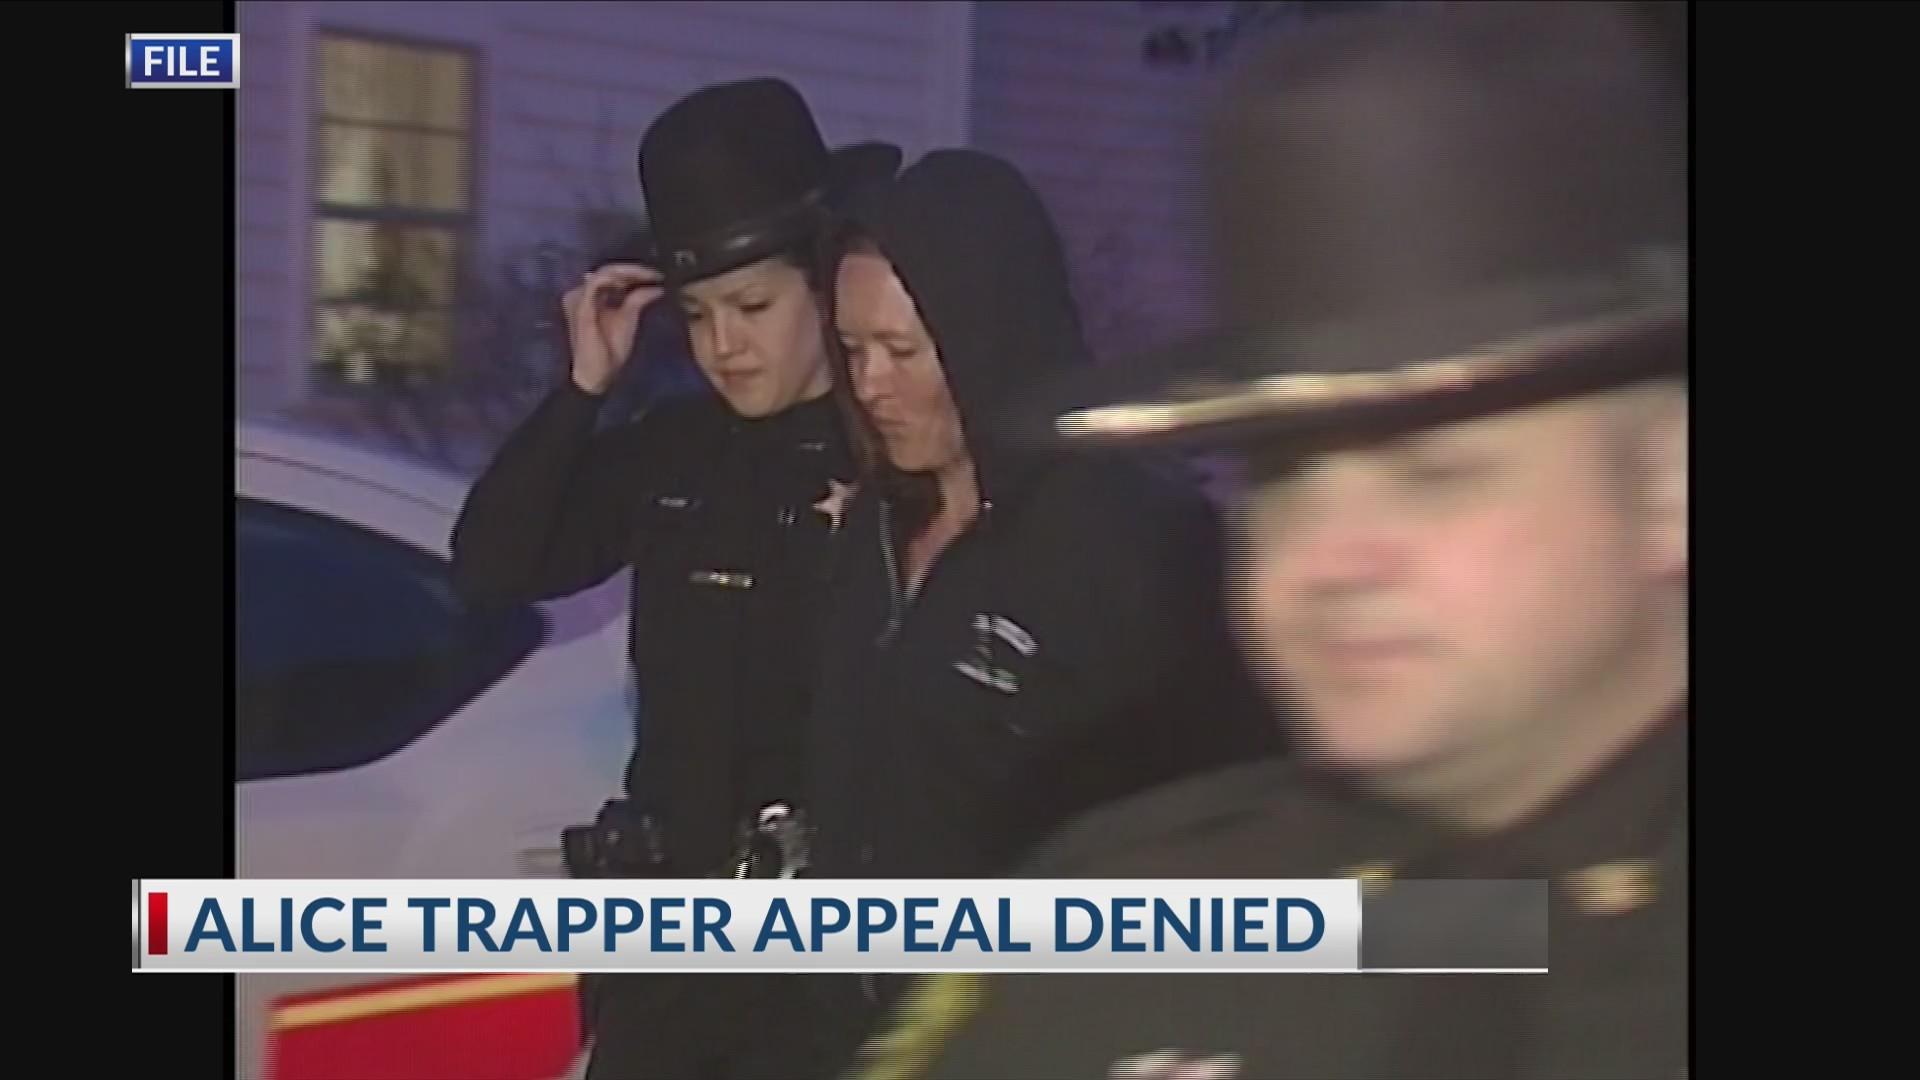 Alice Trapper appeal denied